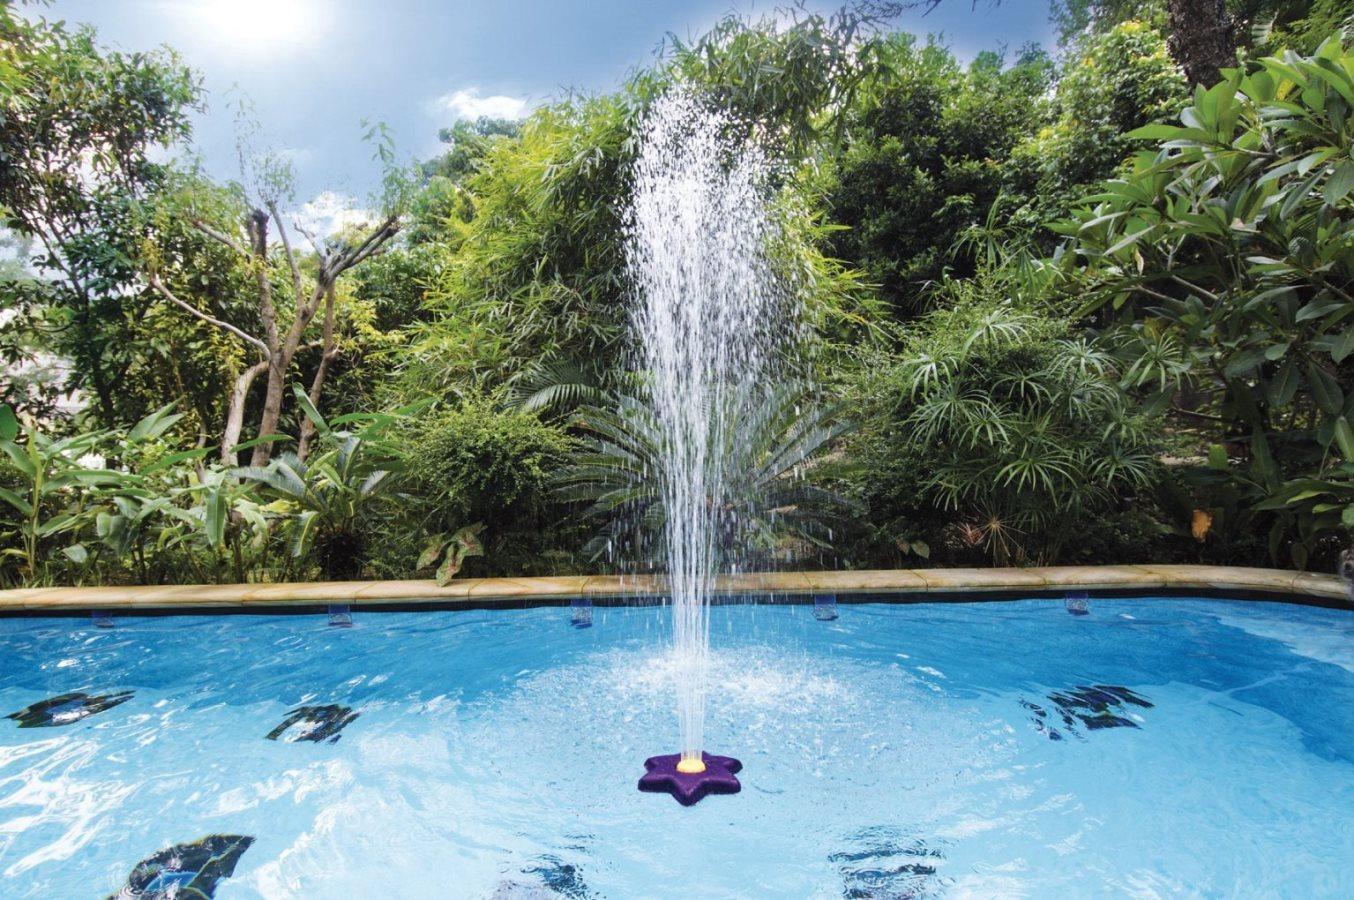 Kokido fontana per piscine fuoriterra da giardino modello fiore k737cbx 77482 - Fontana per piscina ...